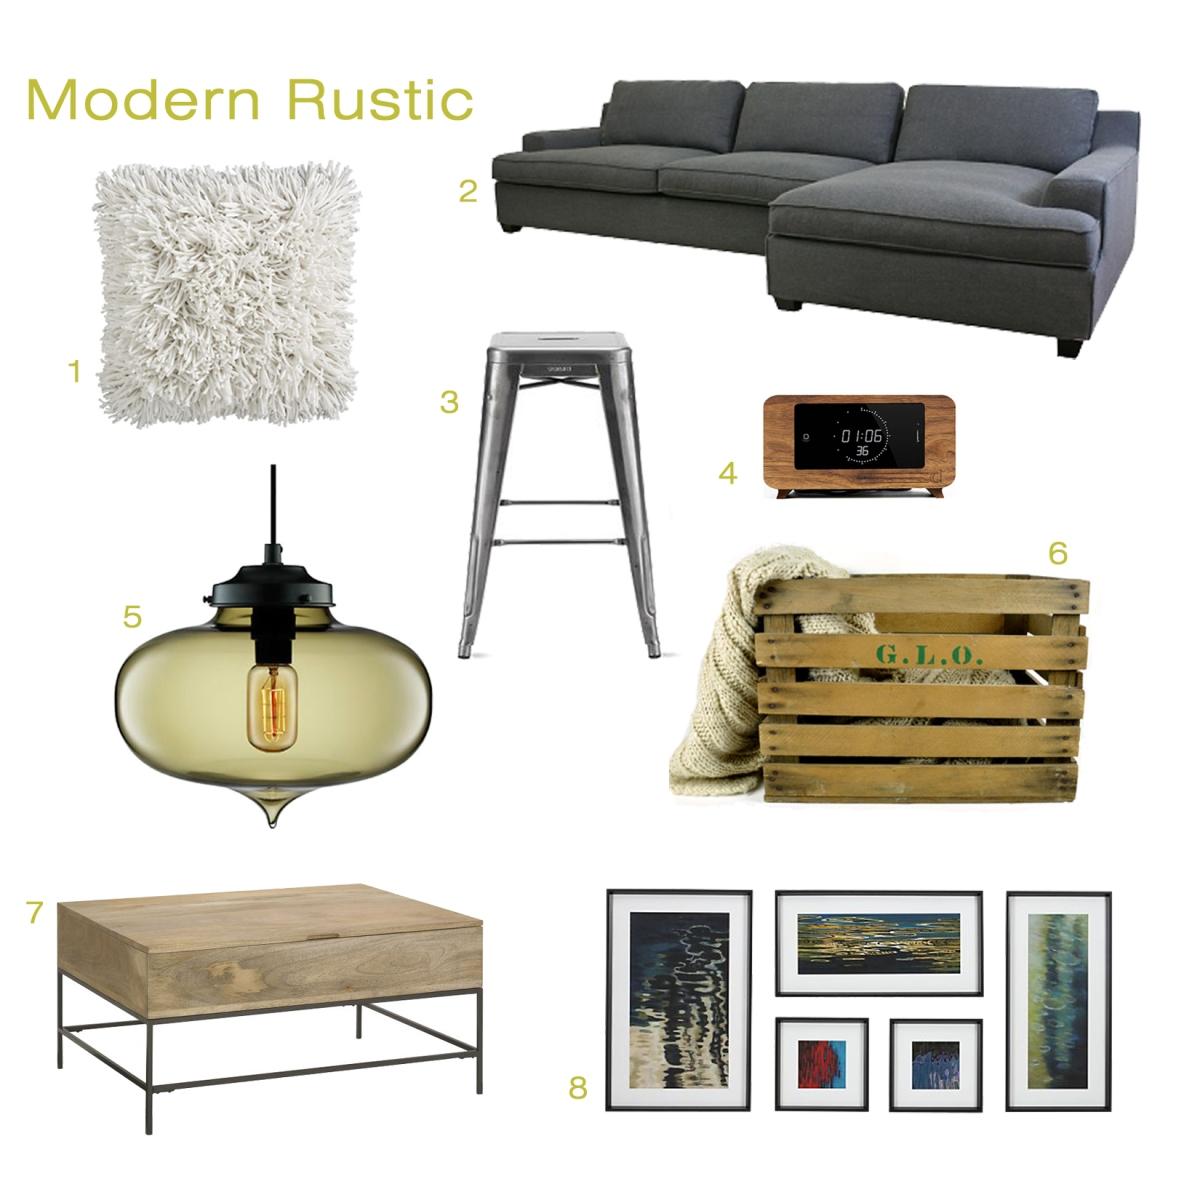 Modern Rustic Interior Design: Modern Rustic – Interior Design Inspiration